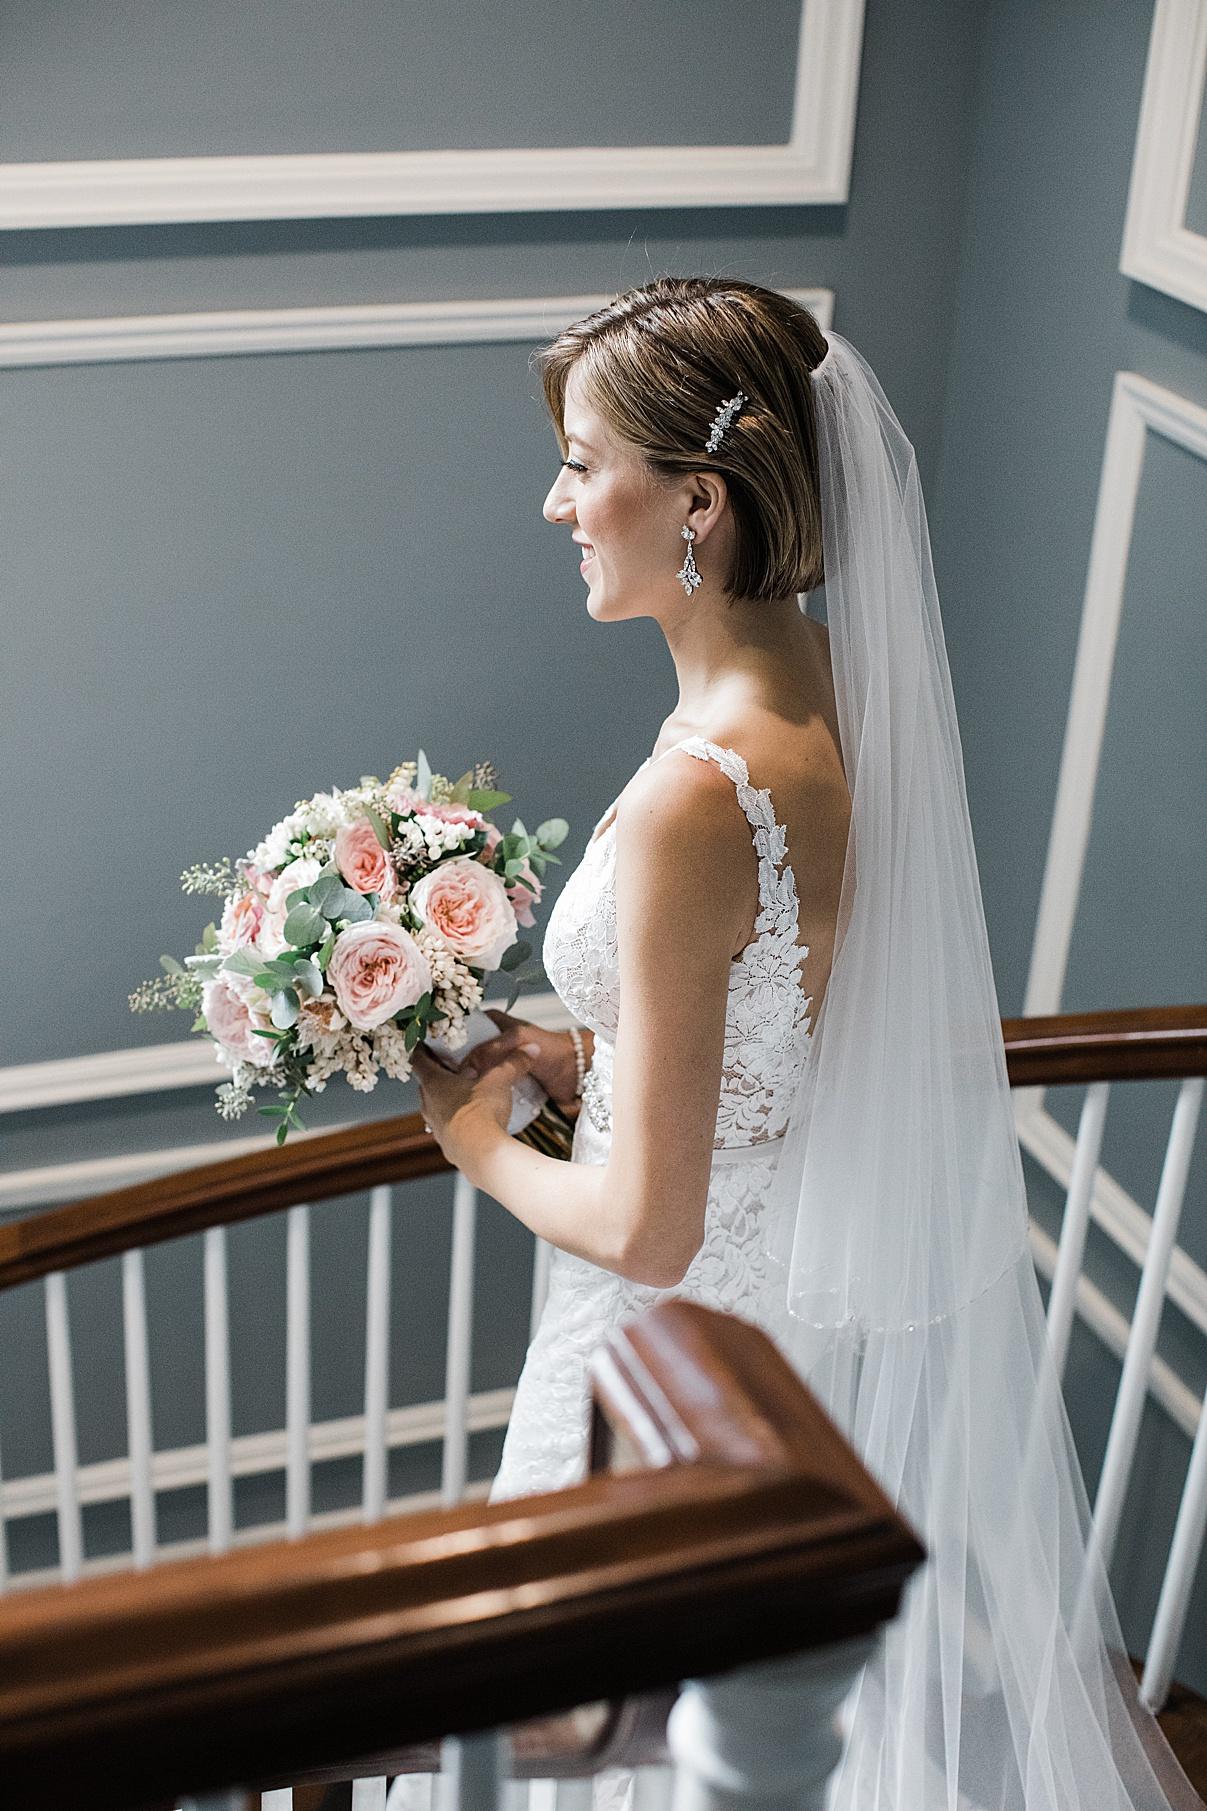 Bride at top of stairs| Harding Waterfront Estate Wedding| Ontario wedding photographer| Toronto wedding photographer| 3 Photography | 3photography.ca